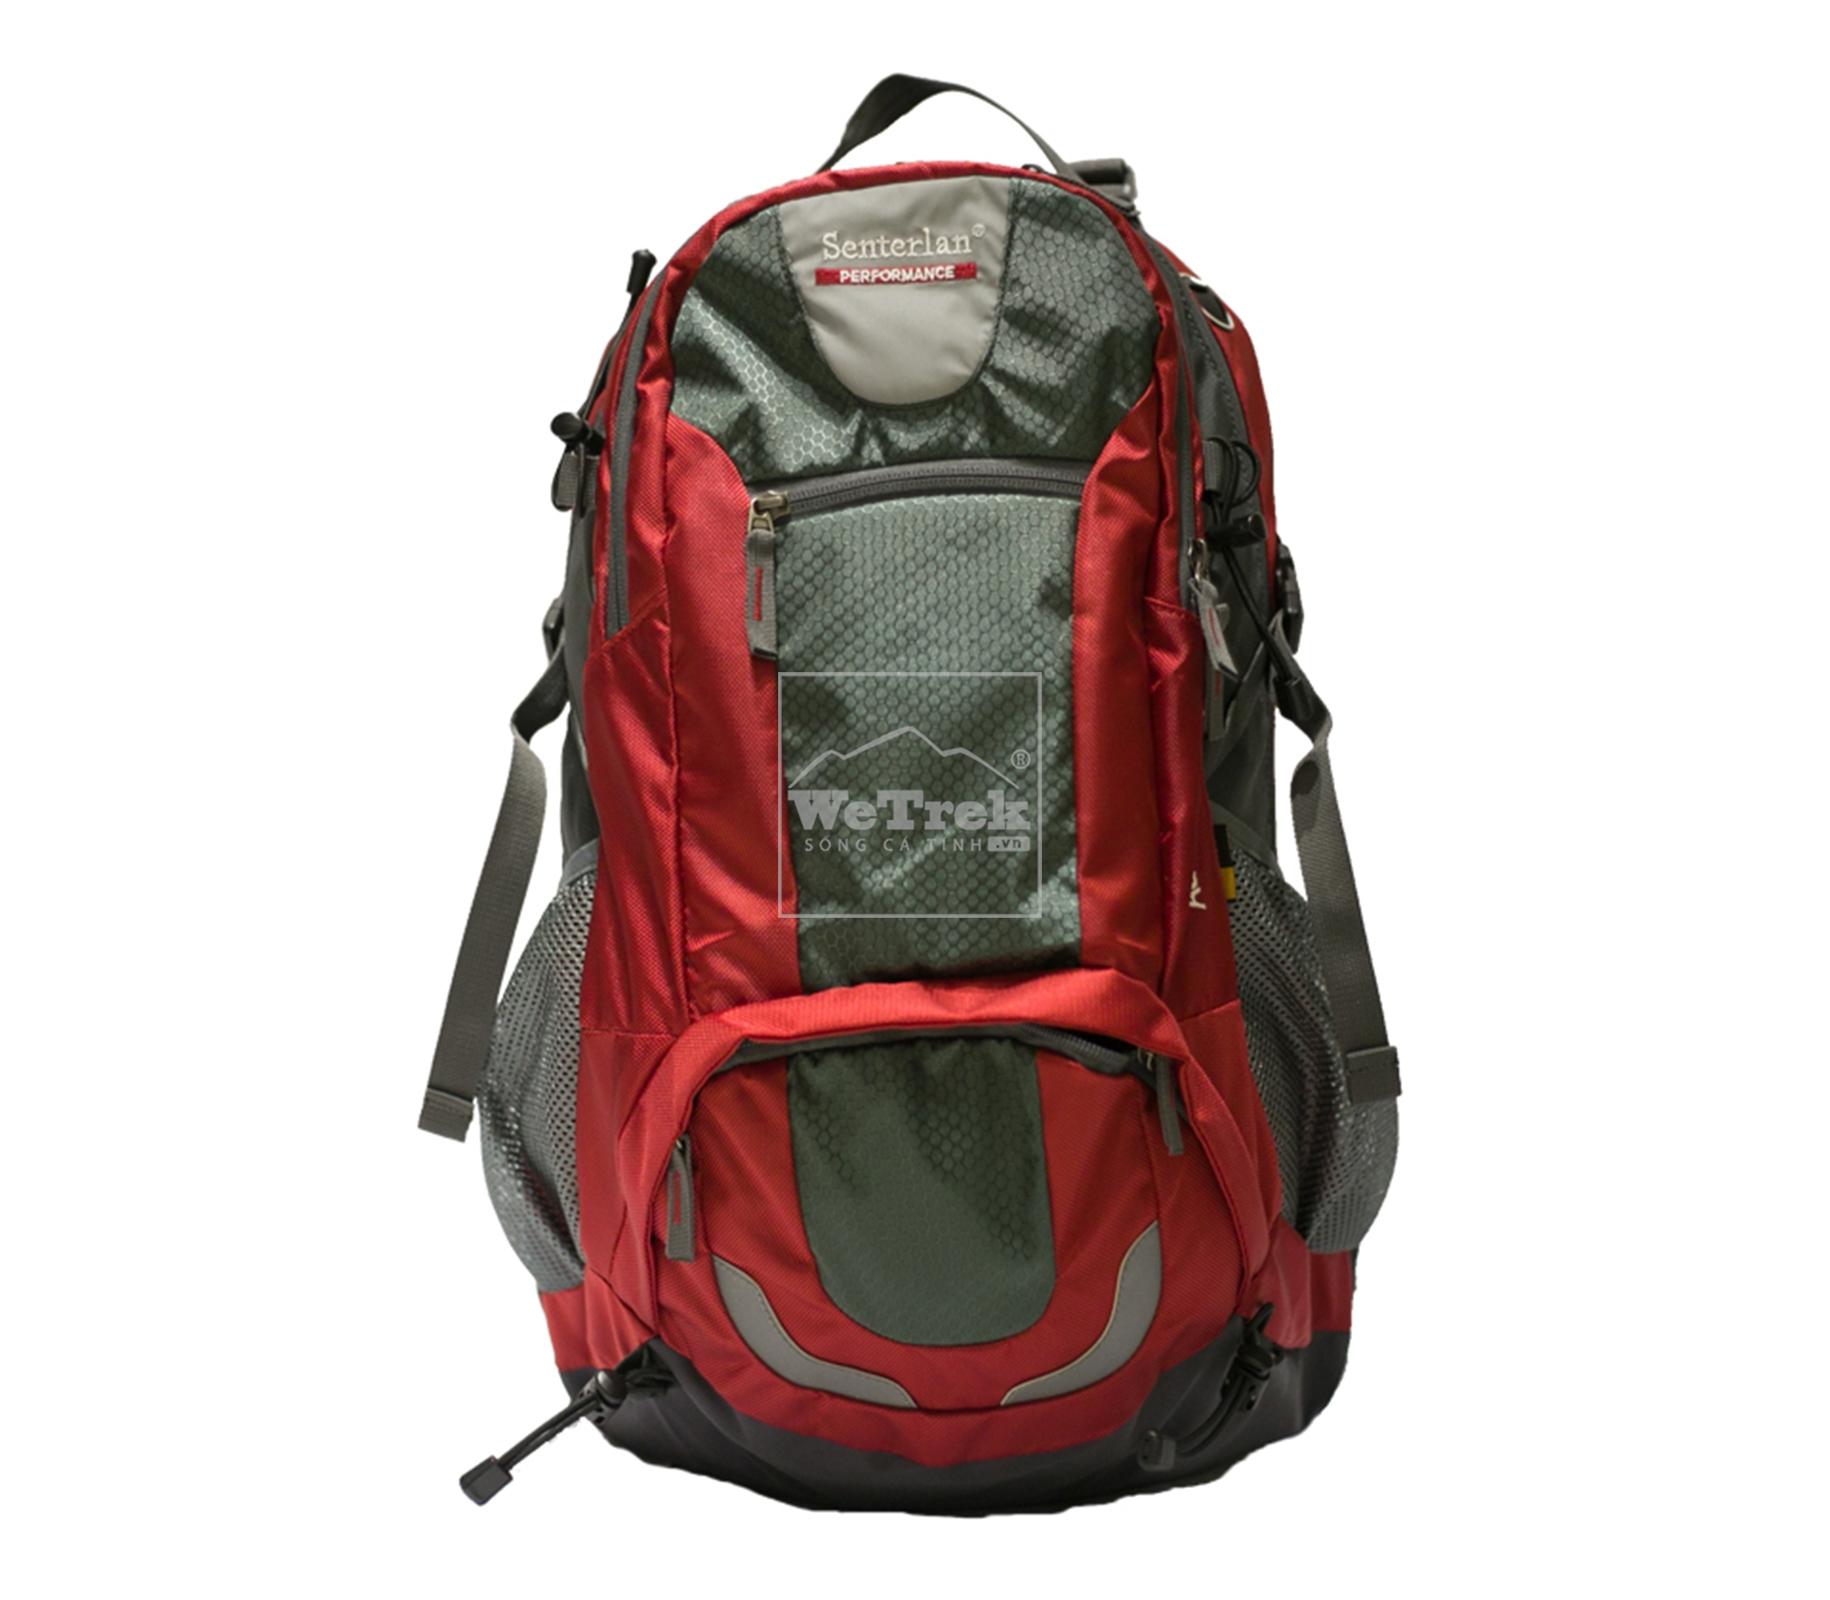 Balo leo núi 38L Senterlan Performance S1553 - 8447 Đỏ